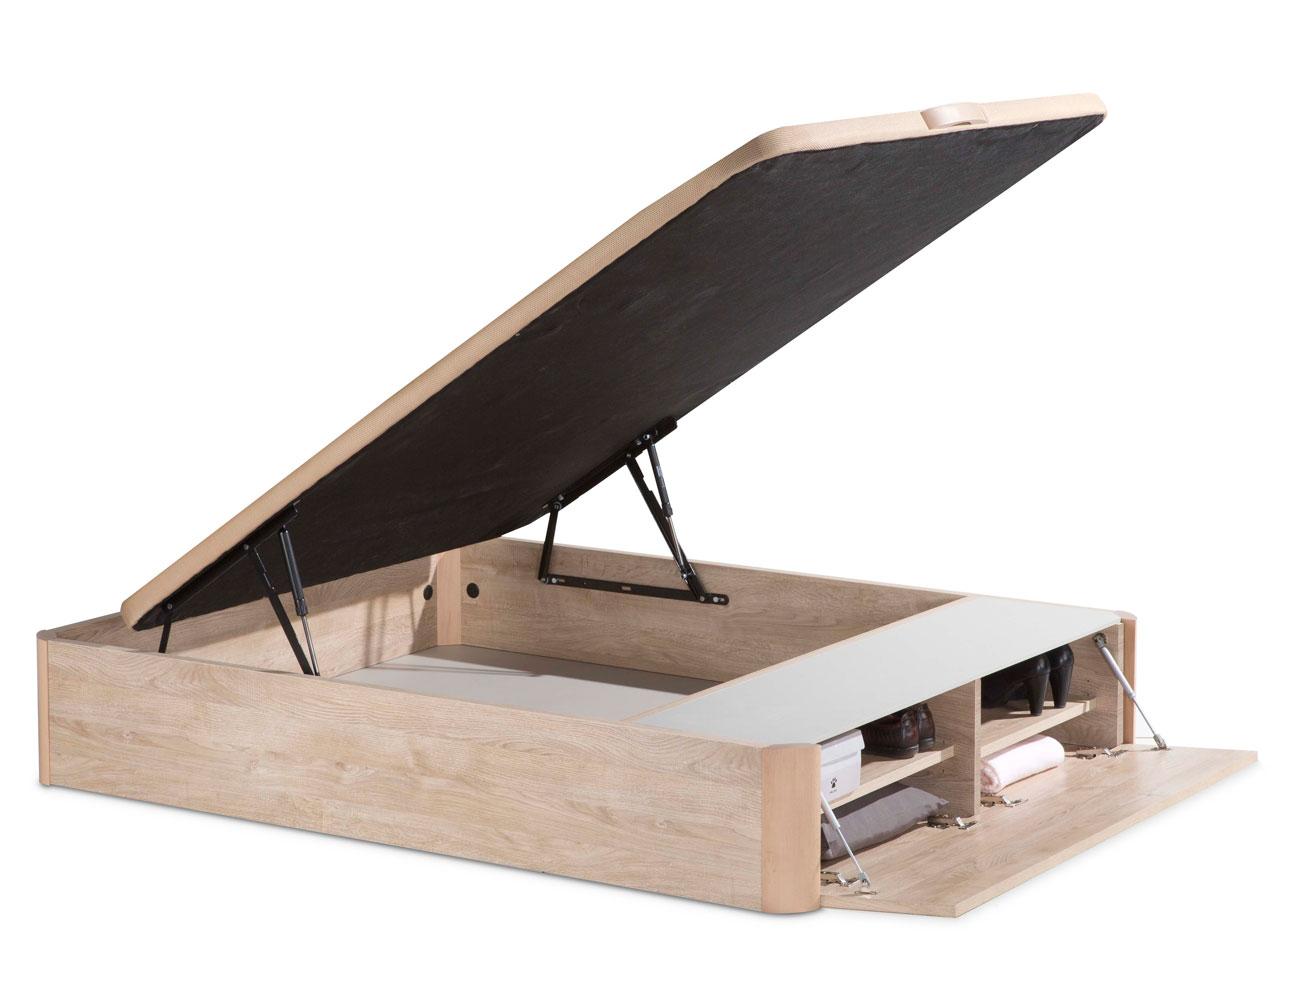 Canape zapatero madera tapa 3d 766